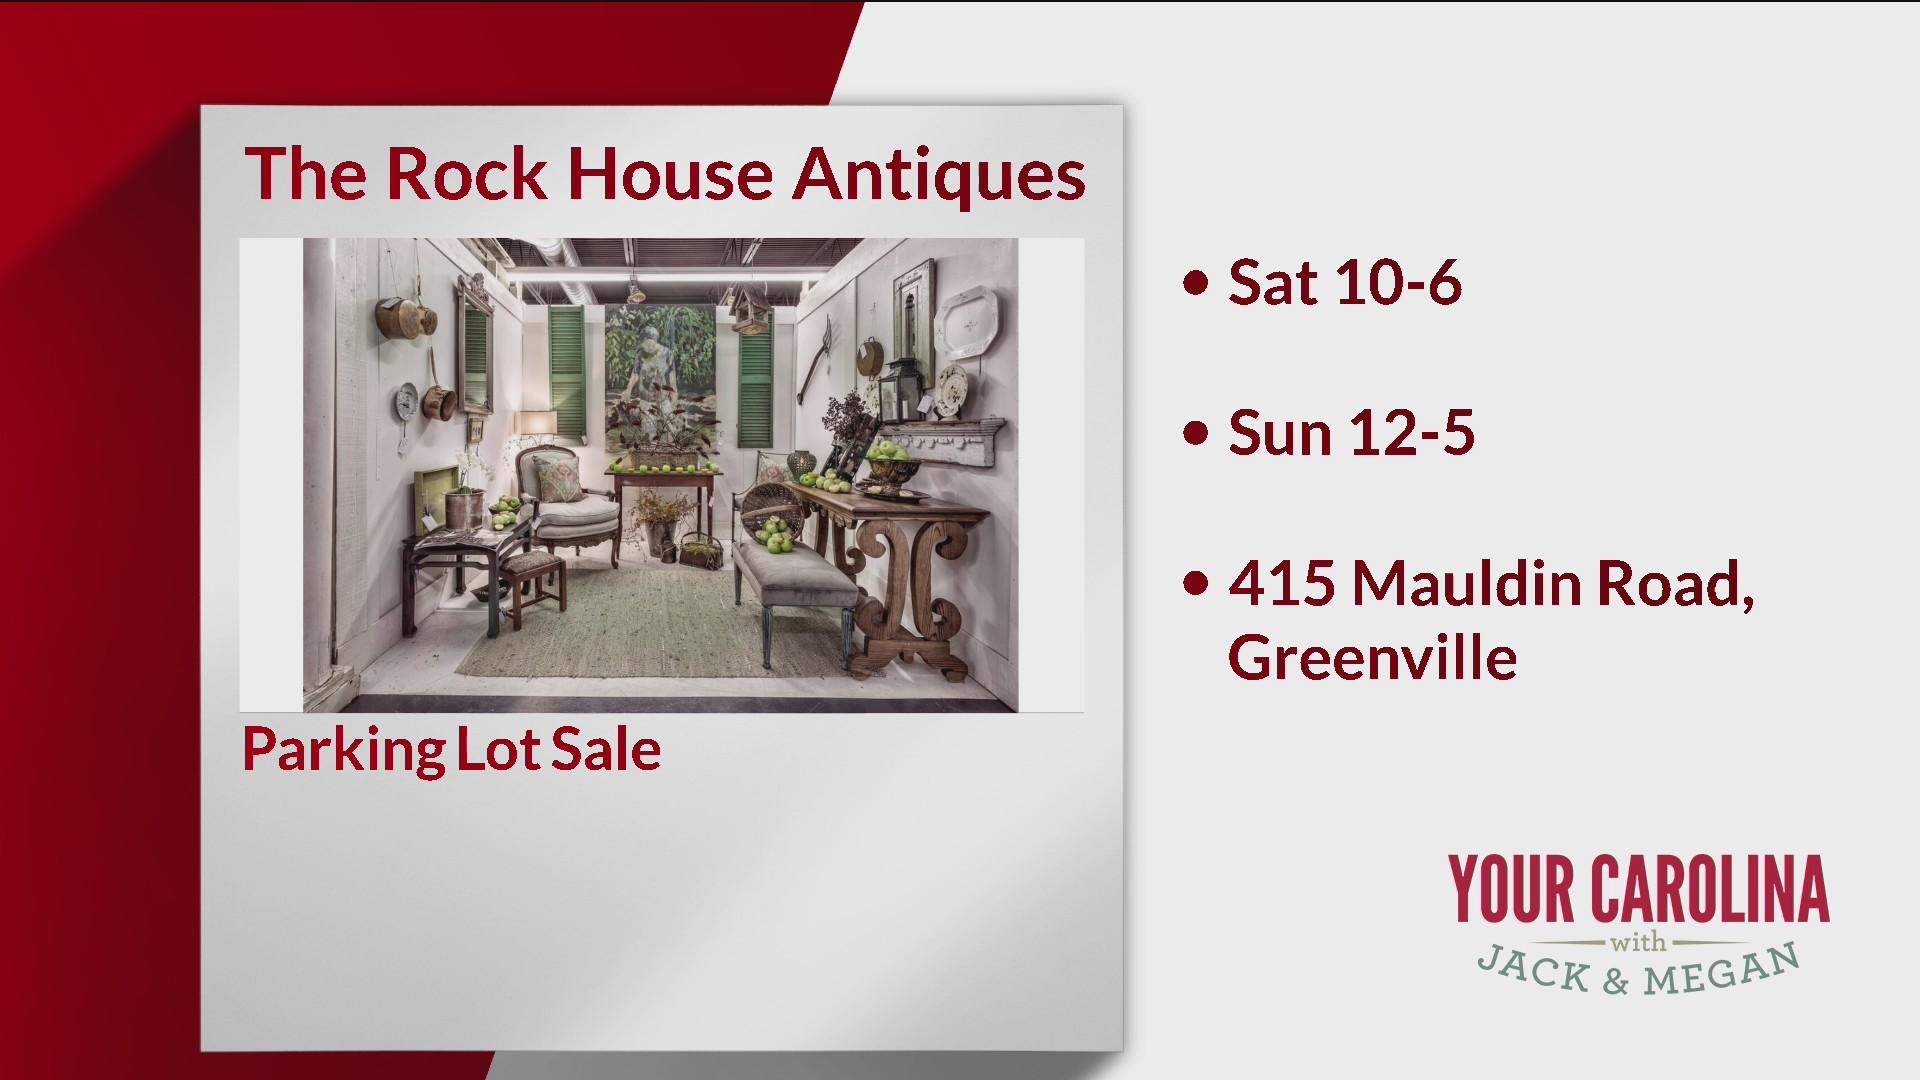 Shop the Lot Sale at The Rock House Antiques